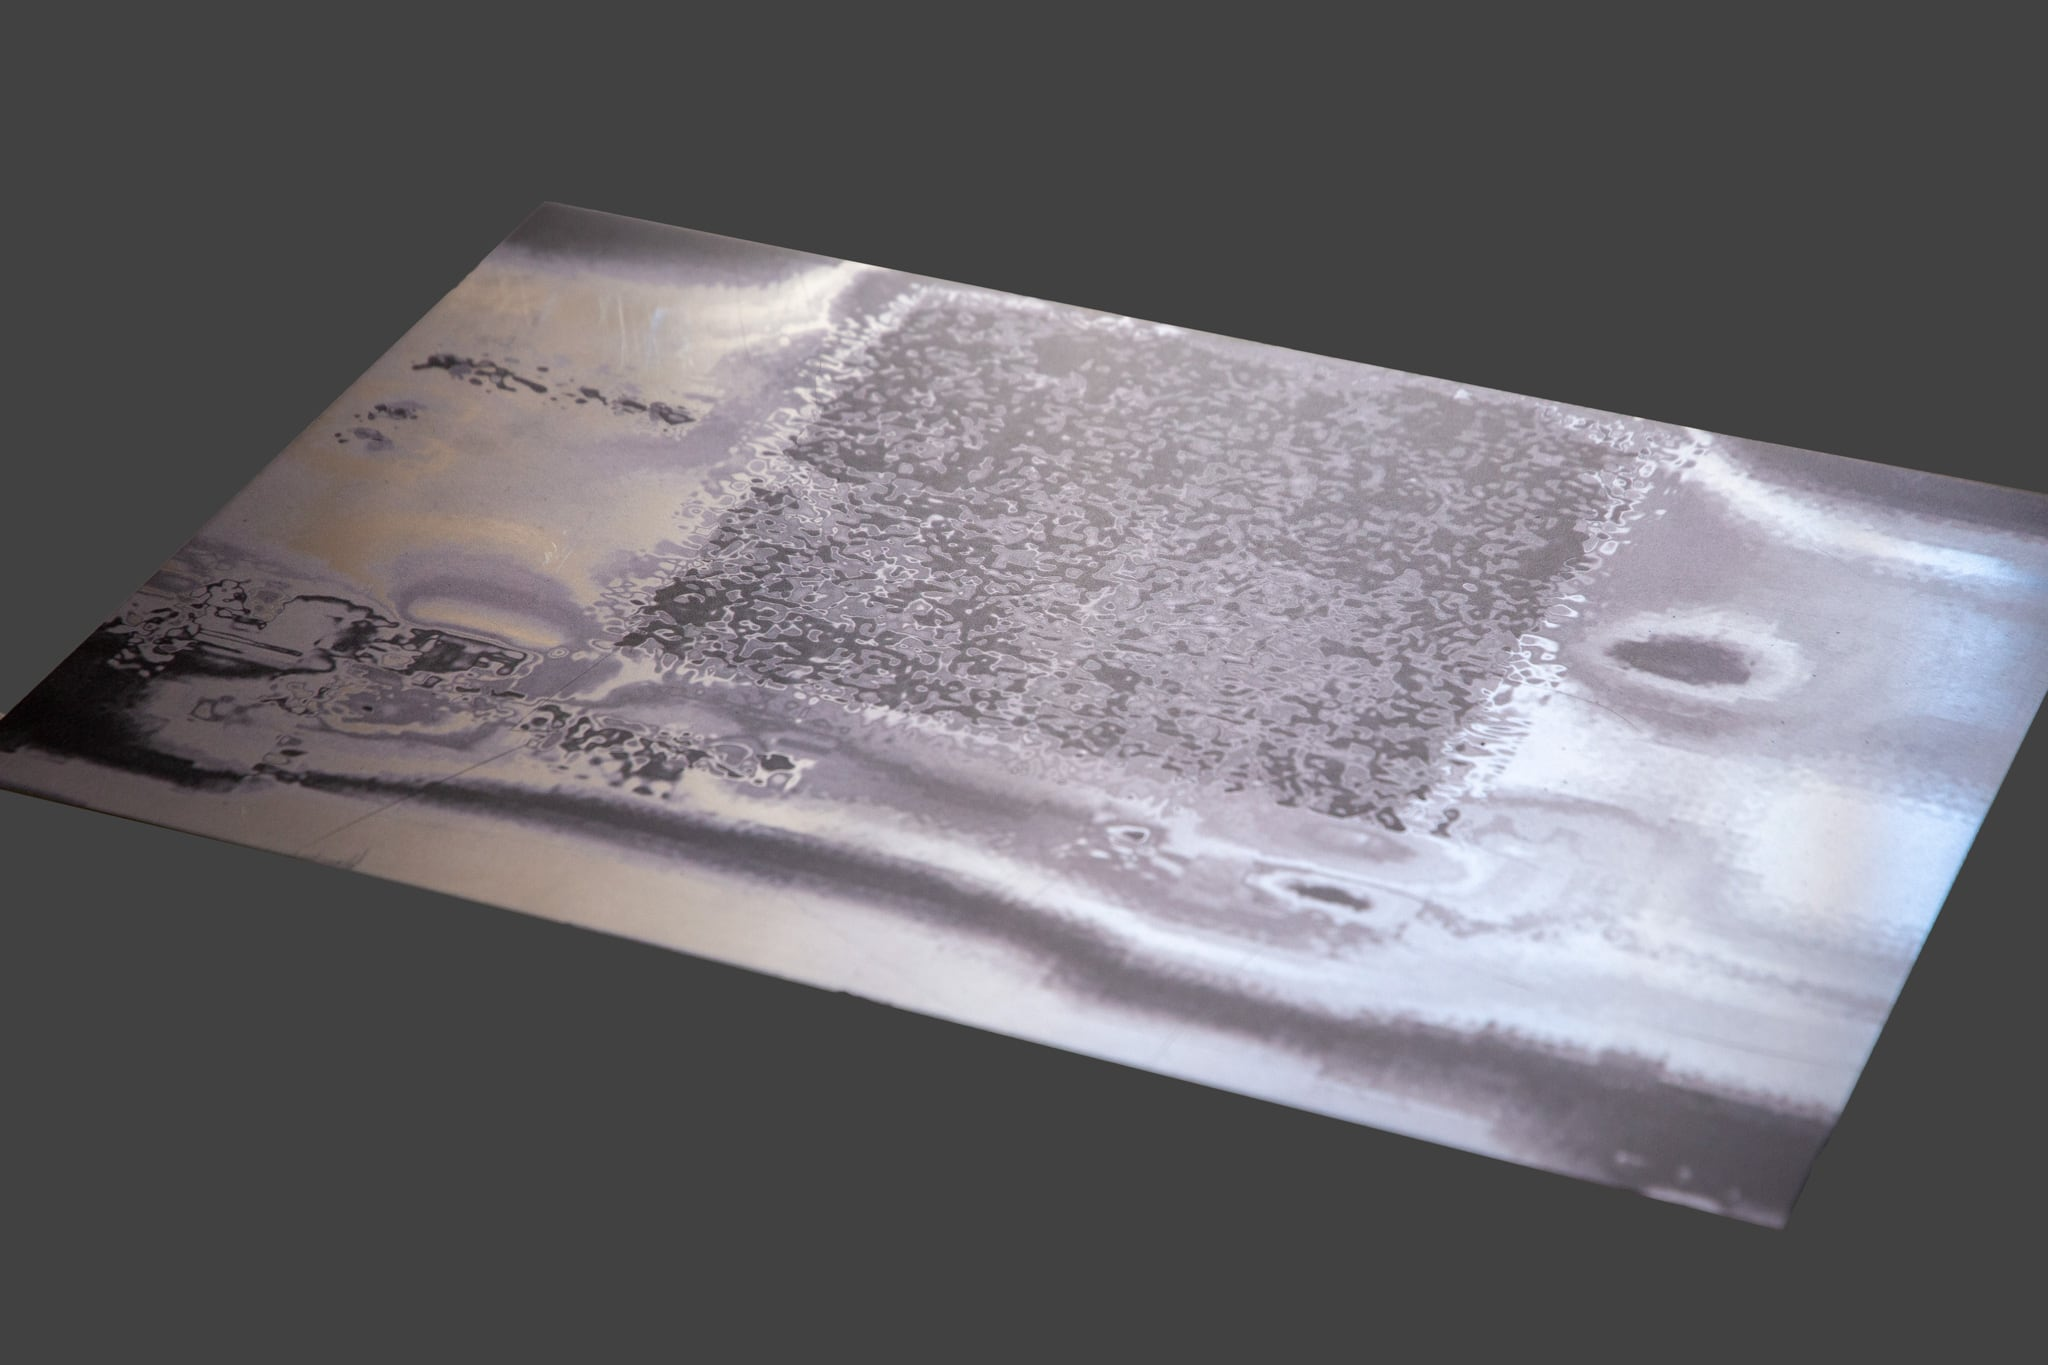 <p><i>Multispec</i> - Plated, 2020. UV Pigment Prints on Aluminum Plate, 350 x 470mm. </p>